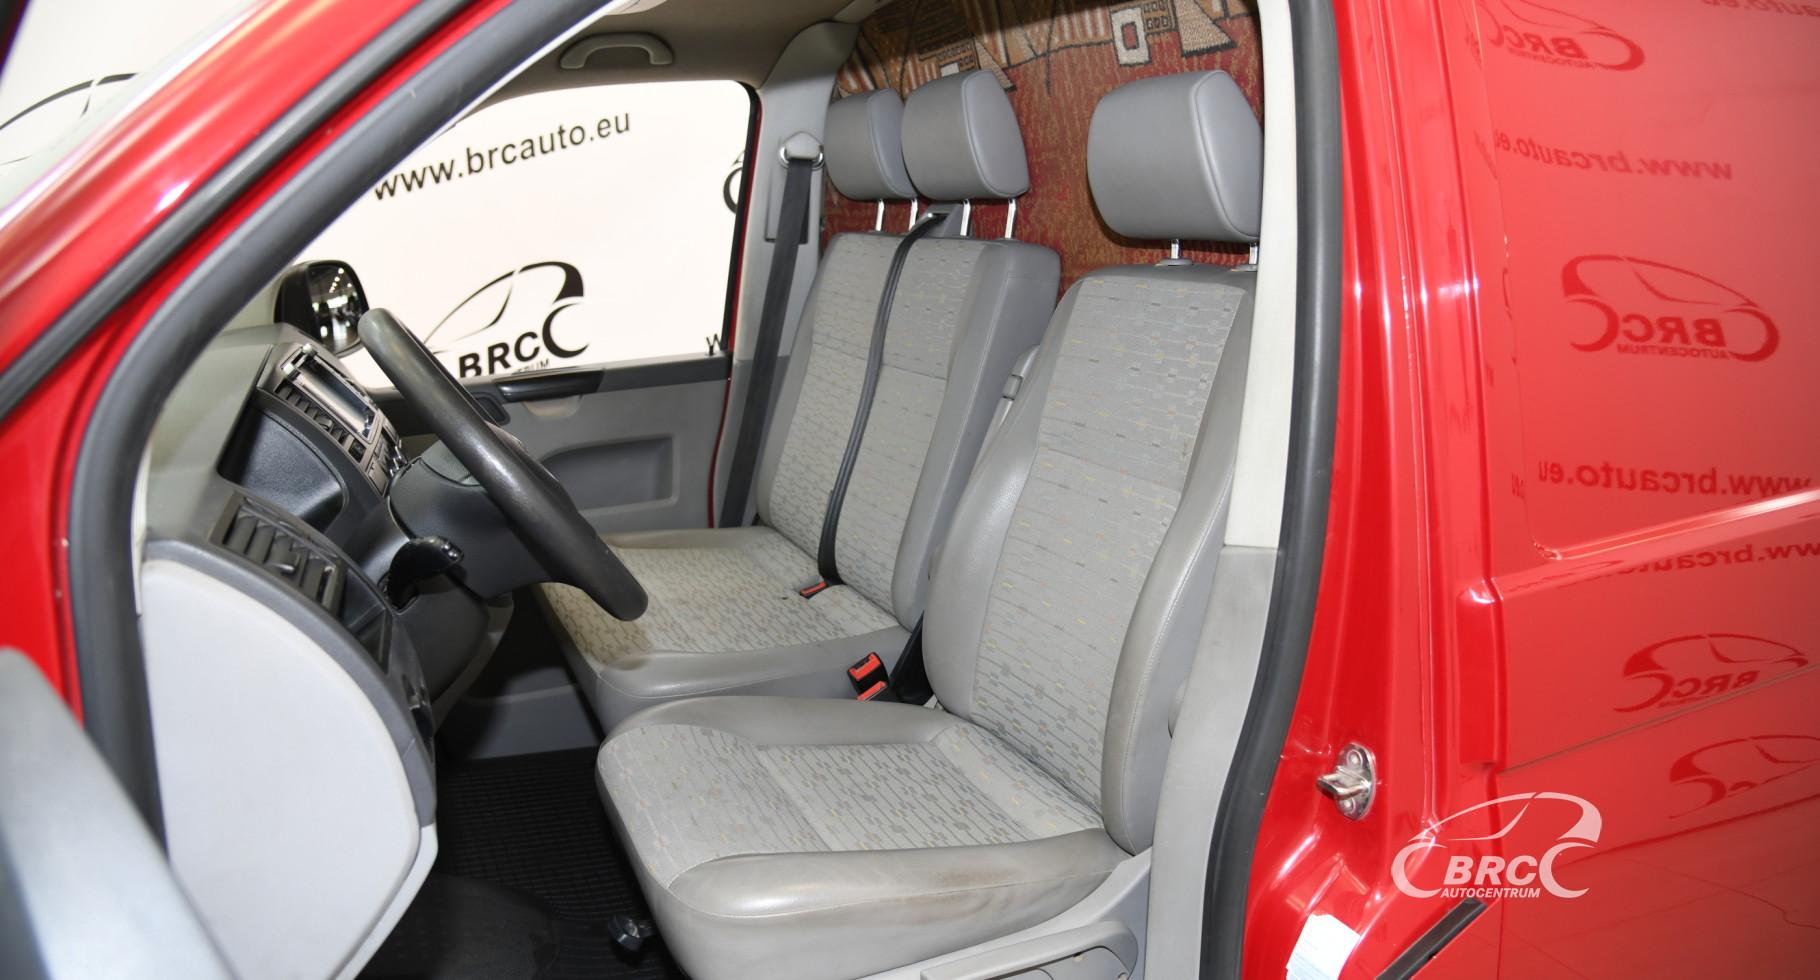 Volkswagen Transporter 2.0 TDI T5 4Motion